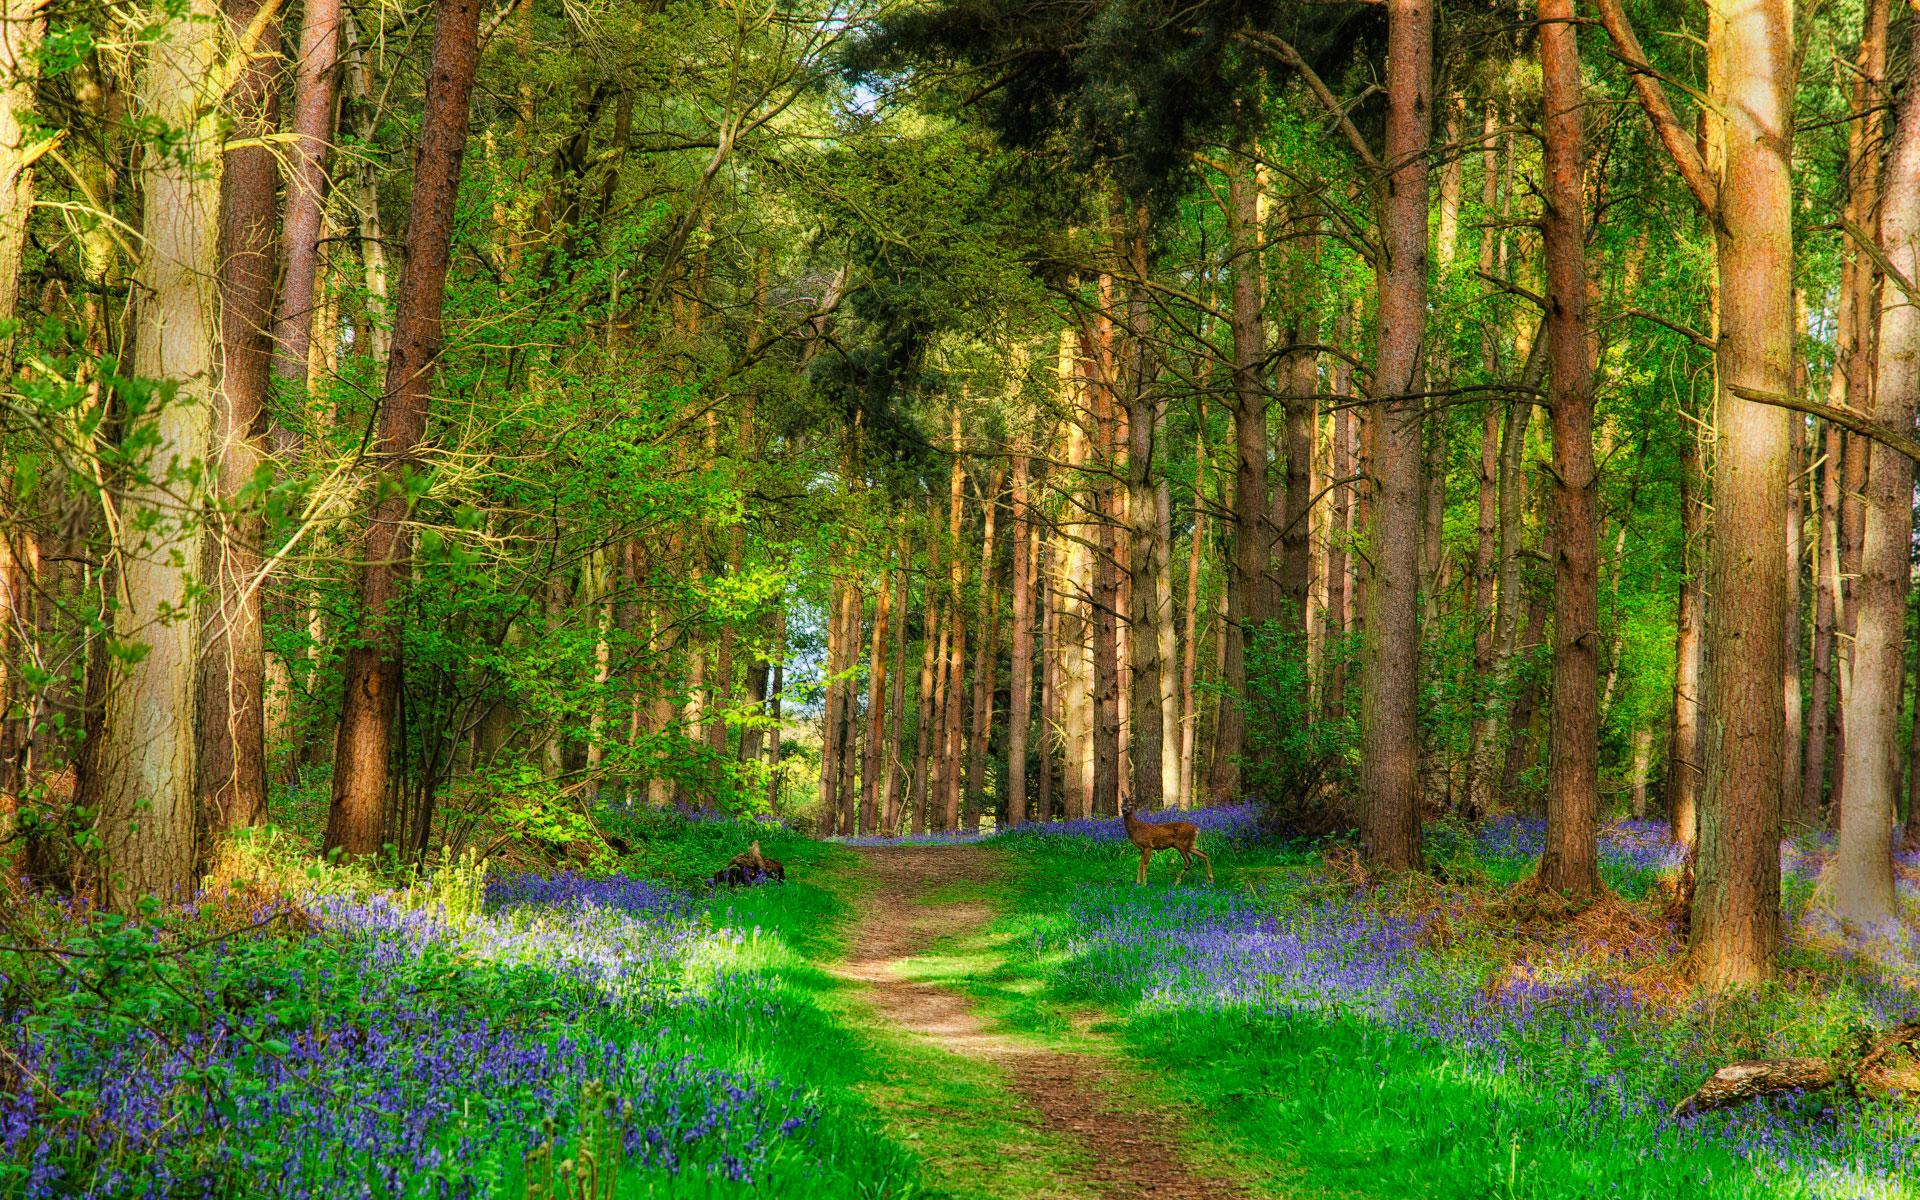 мне девченка красивые картинки о природе лес еще